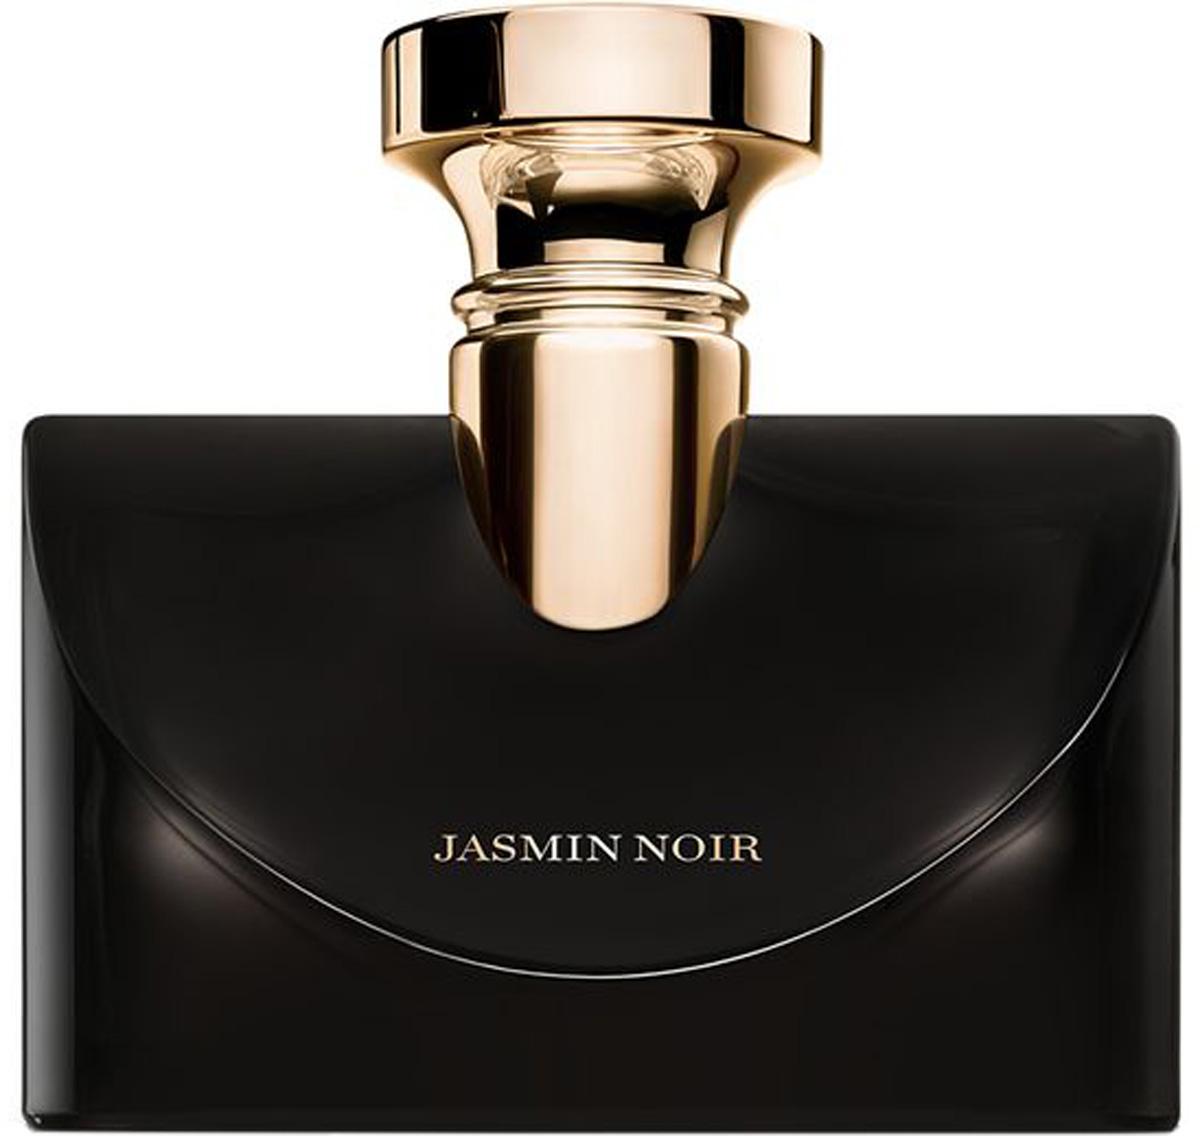 Bvlgari Splendida Jasmin Noir Парфюмерная вода женская, 30 мл - Парфюмерия